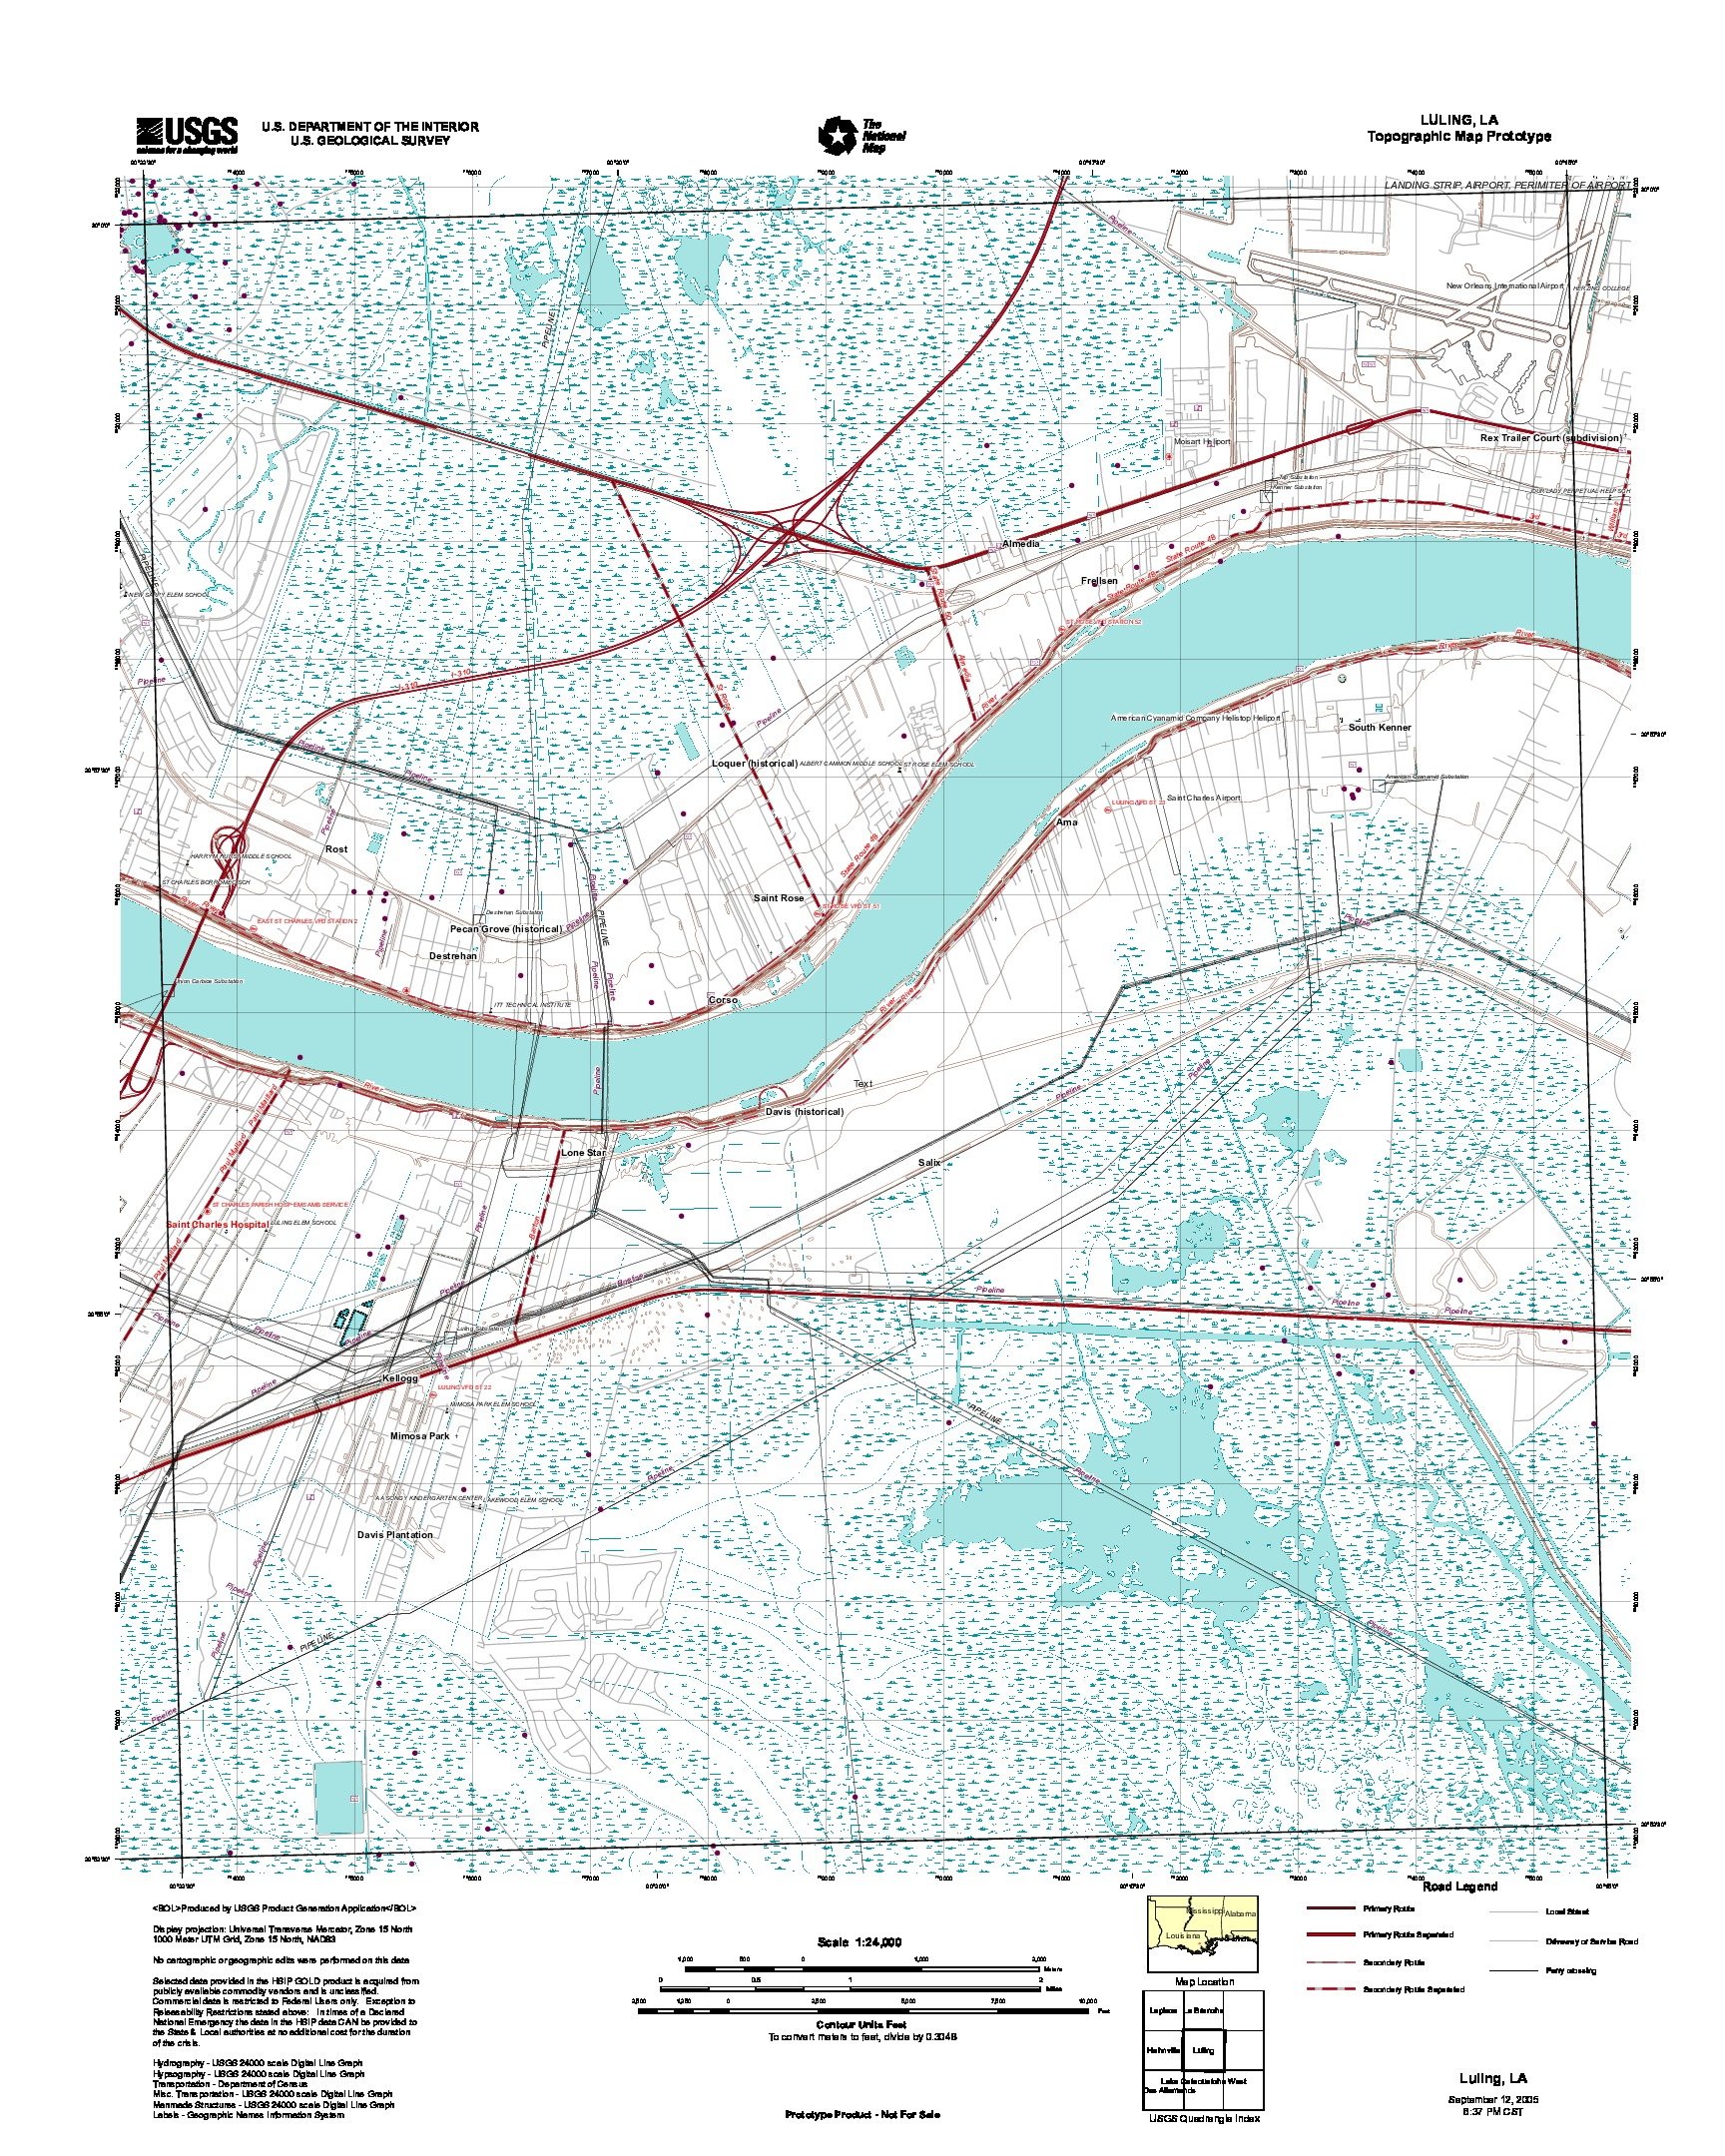 Luling, Topographic Map Prototype, Louisiana, United States, September 12, 2005